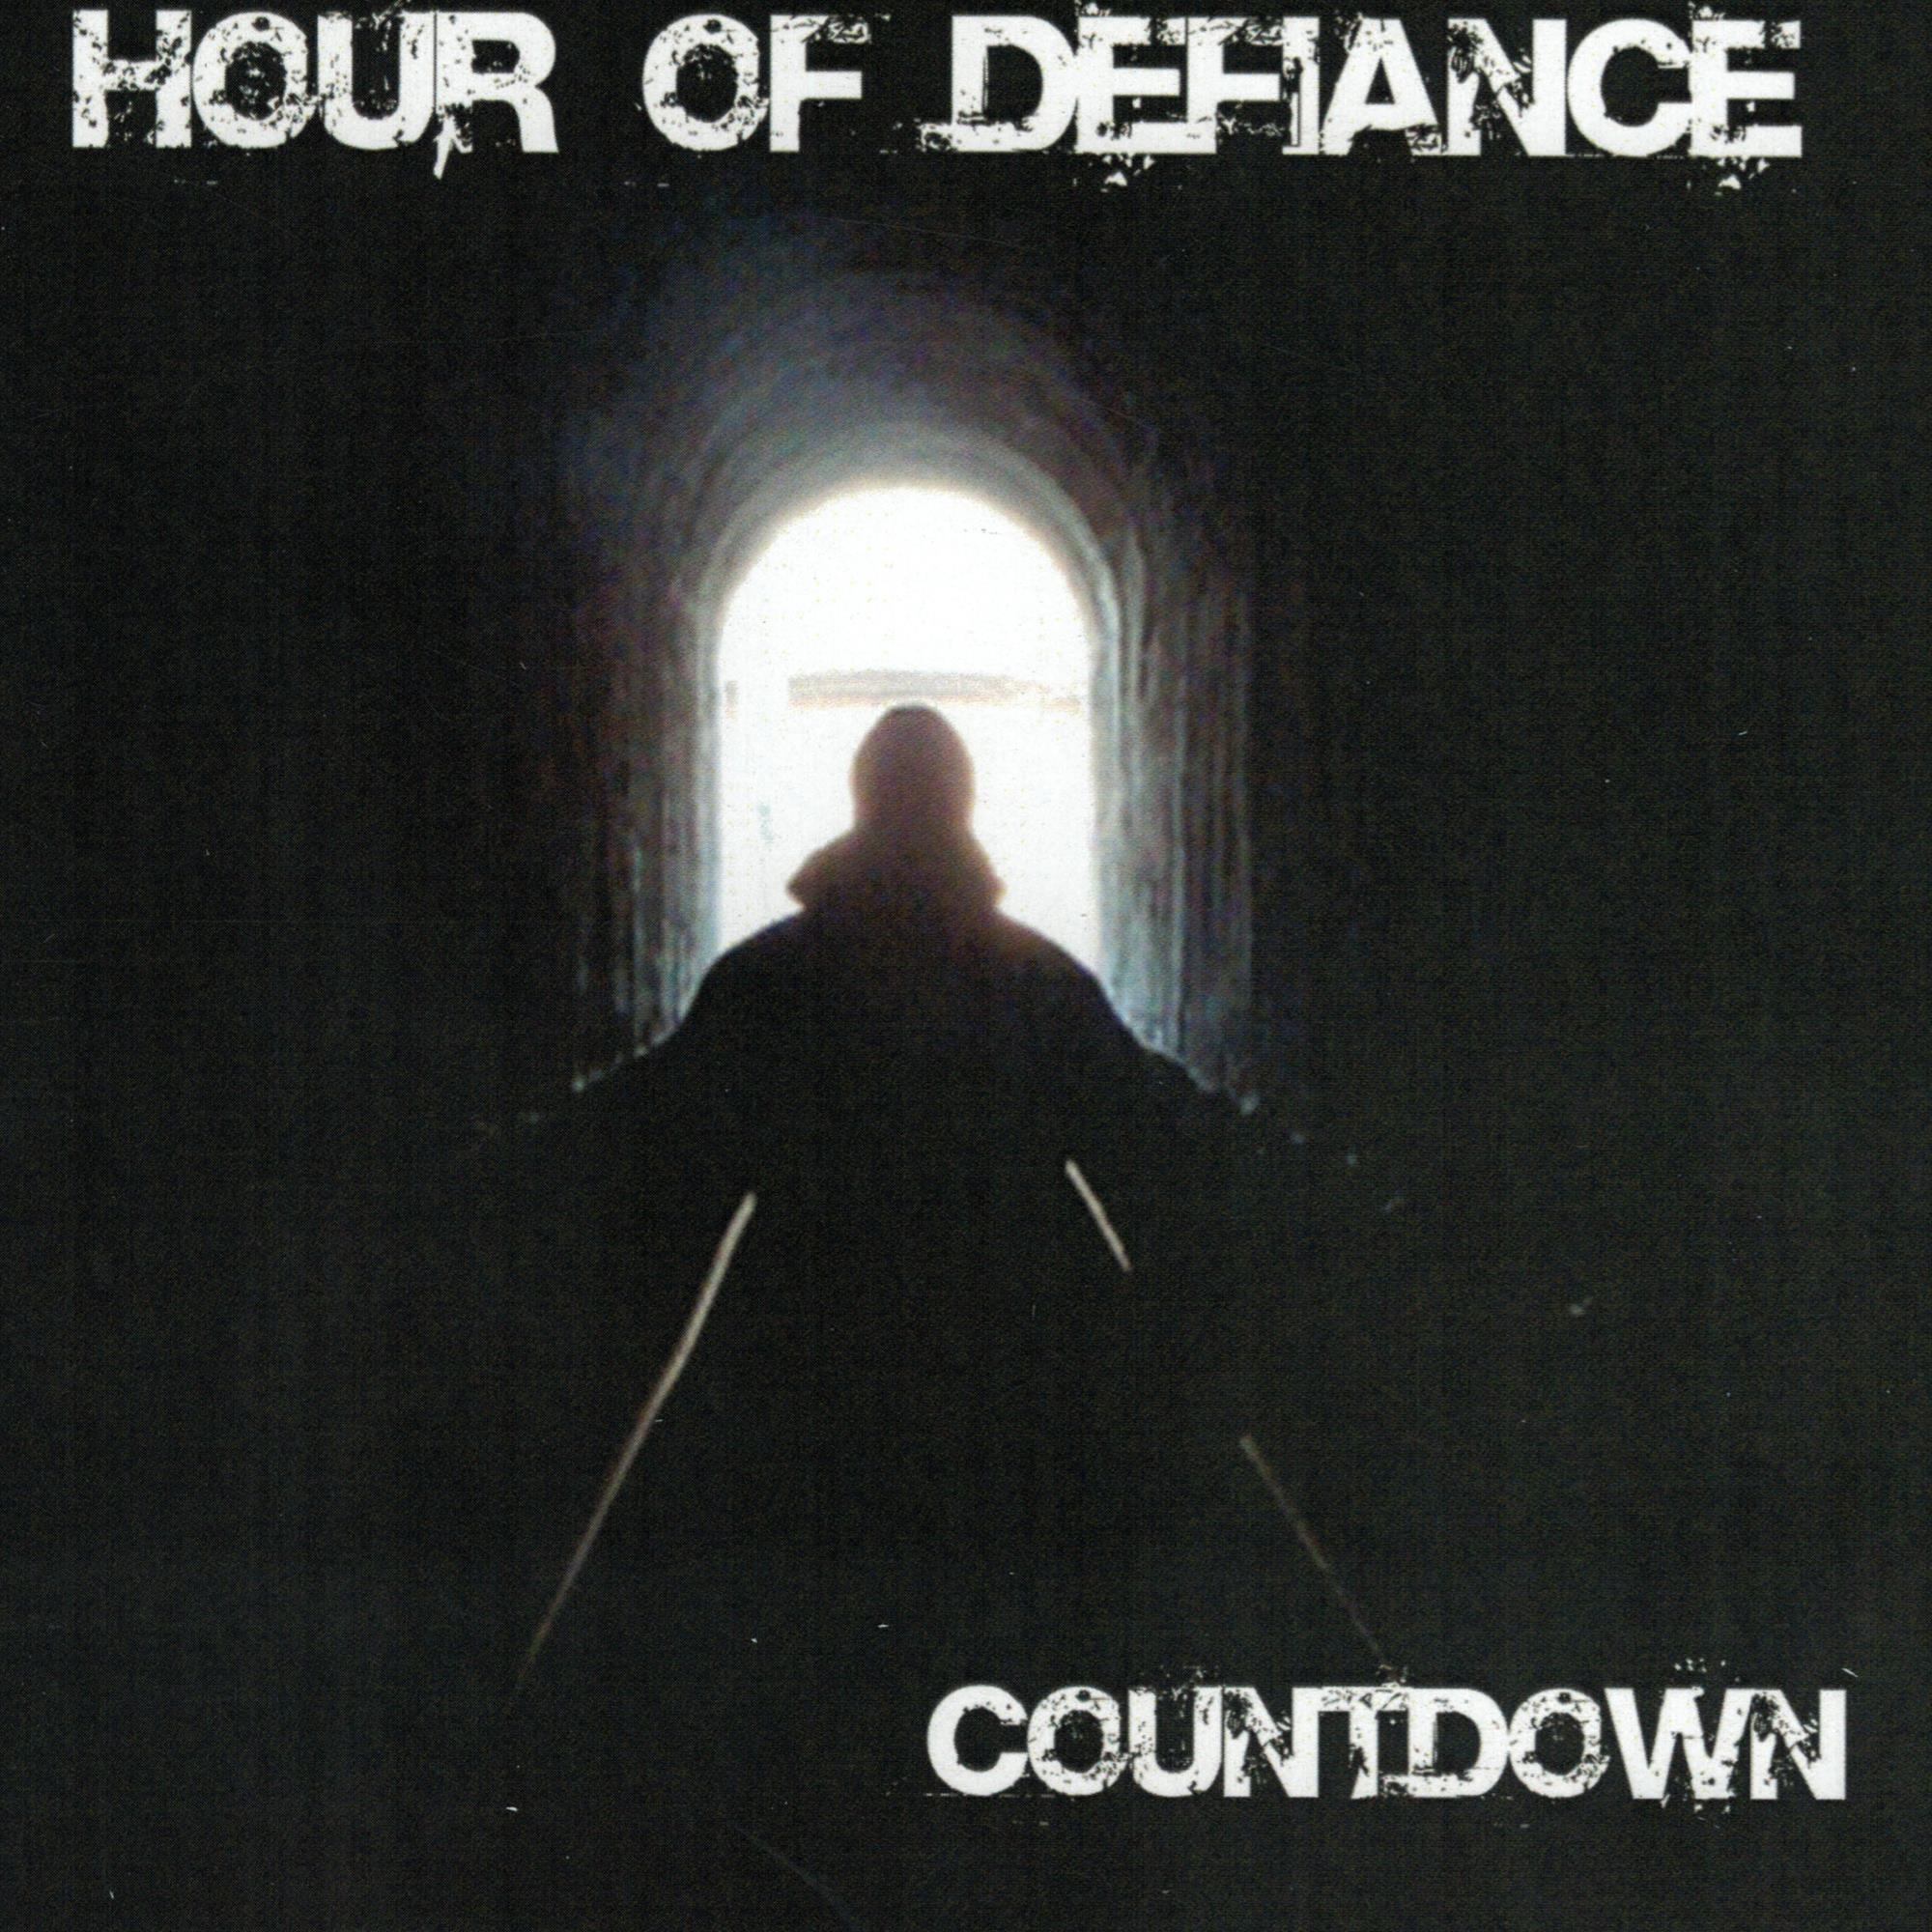 Countdown CD